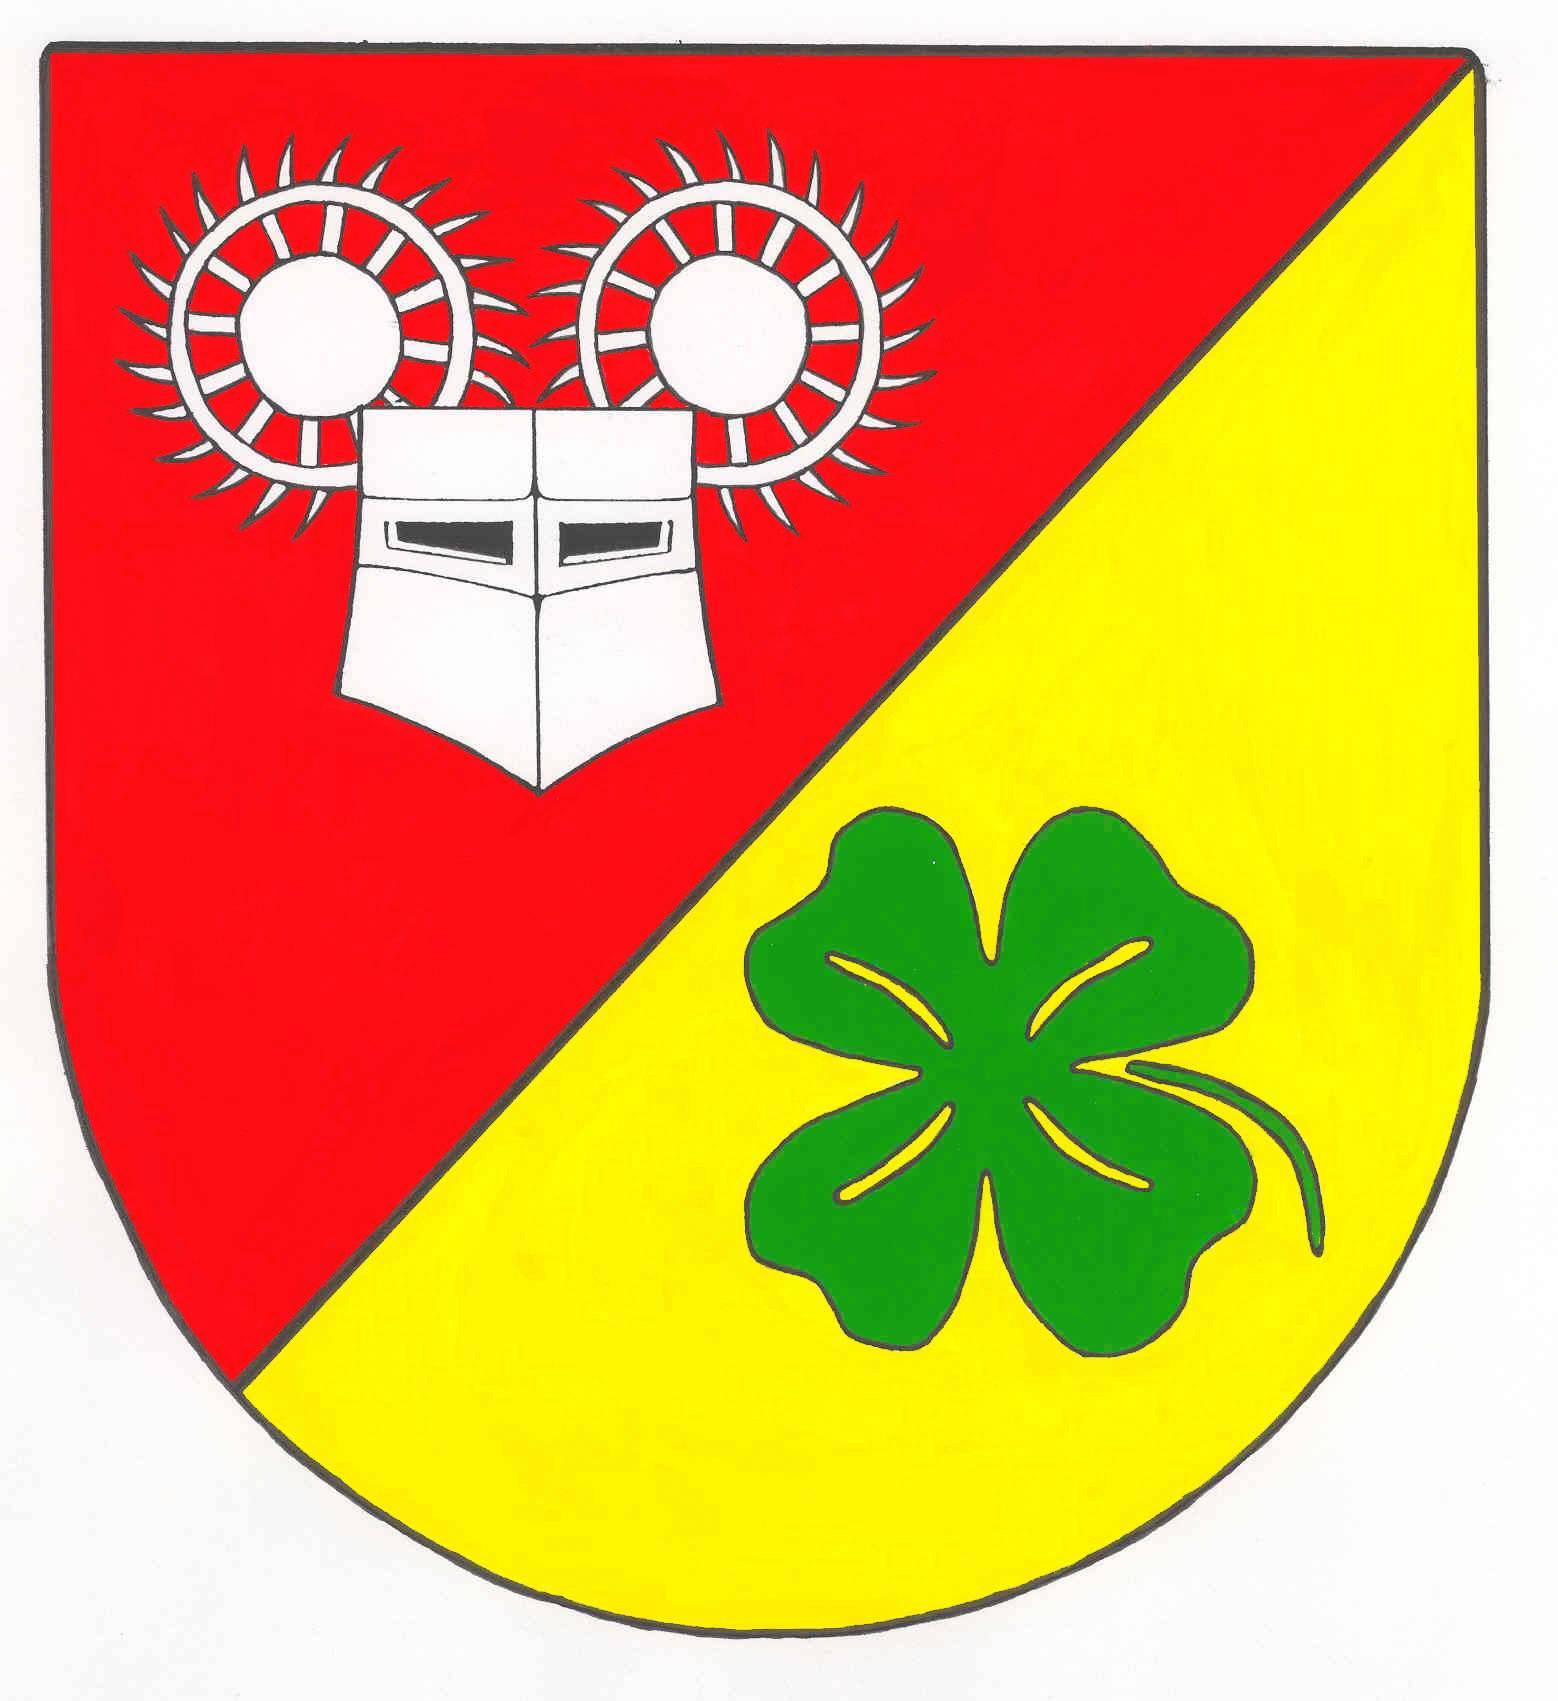 Wappen GemeindeRathjensdorf, Kreis Plön